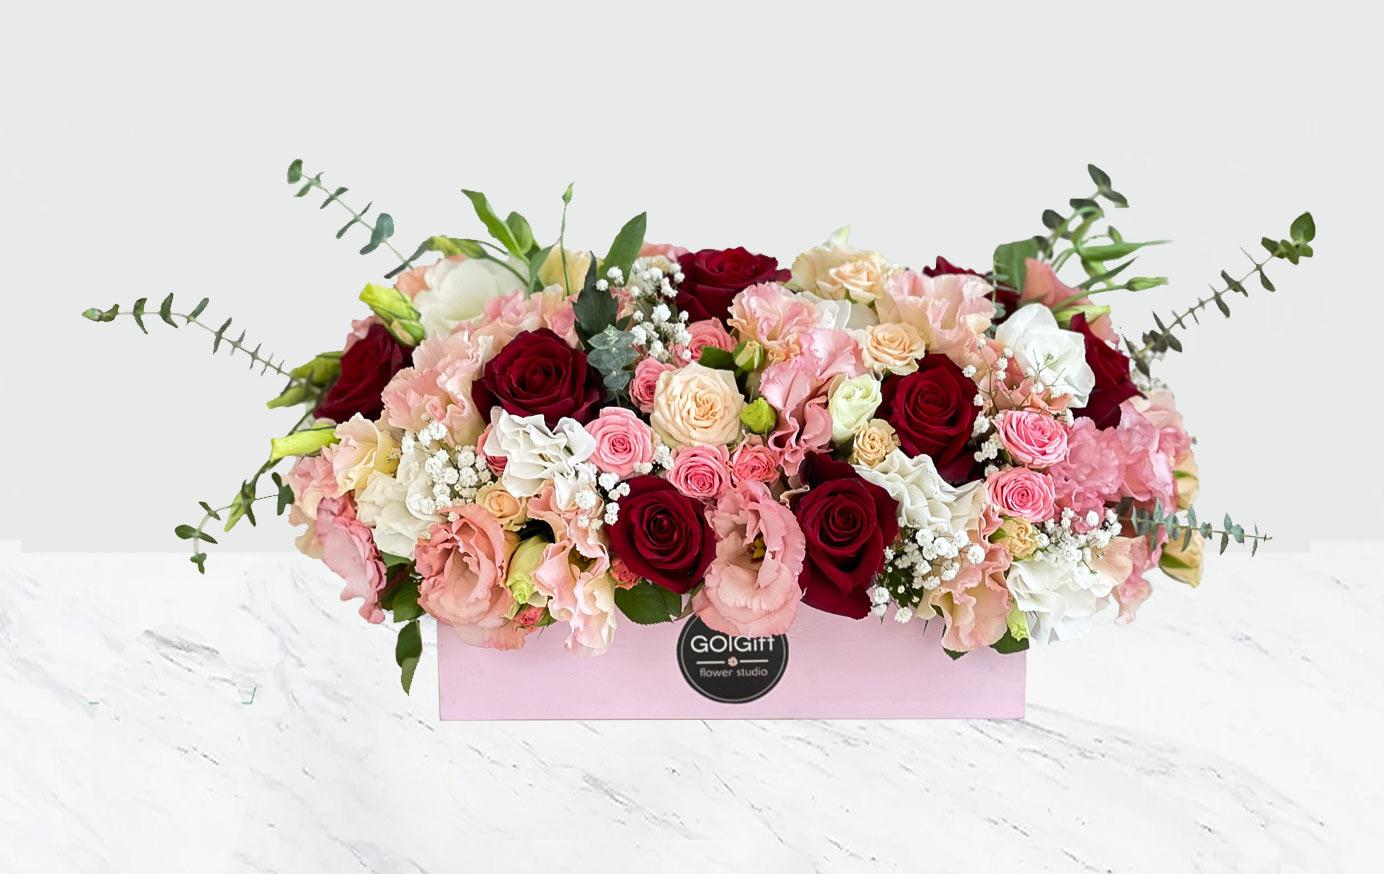 باکس گل دلبر